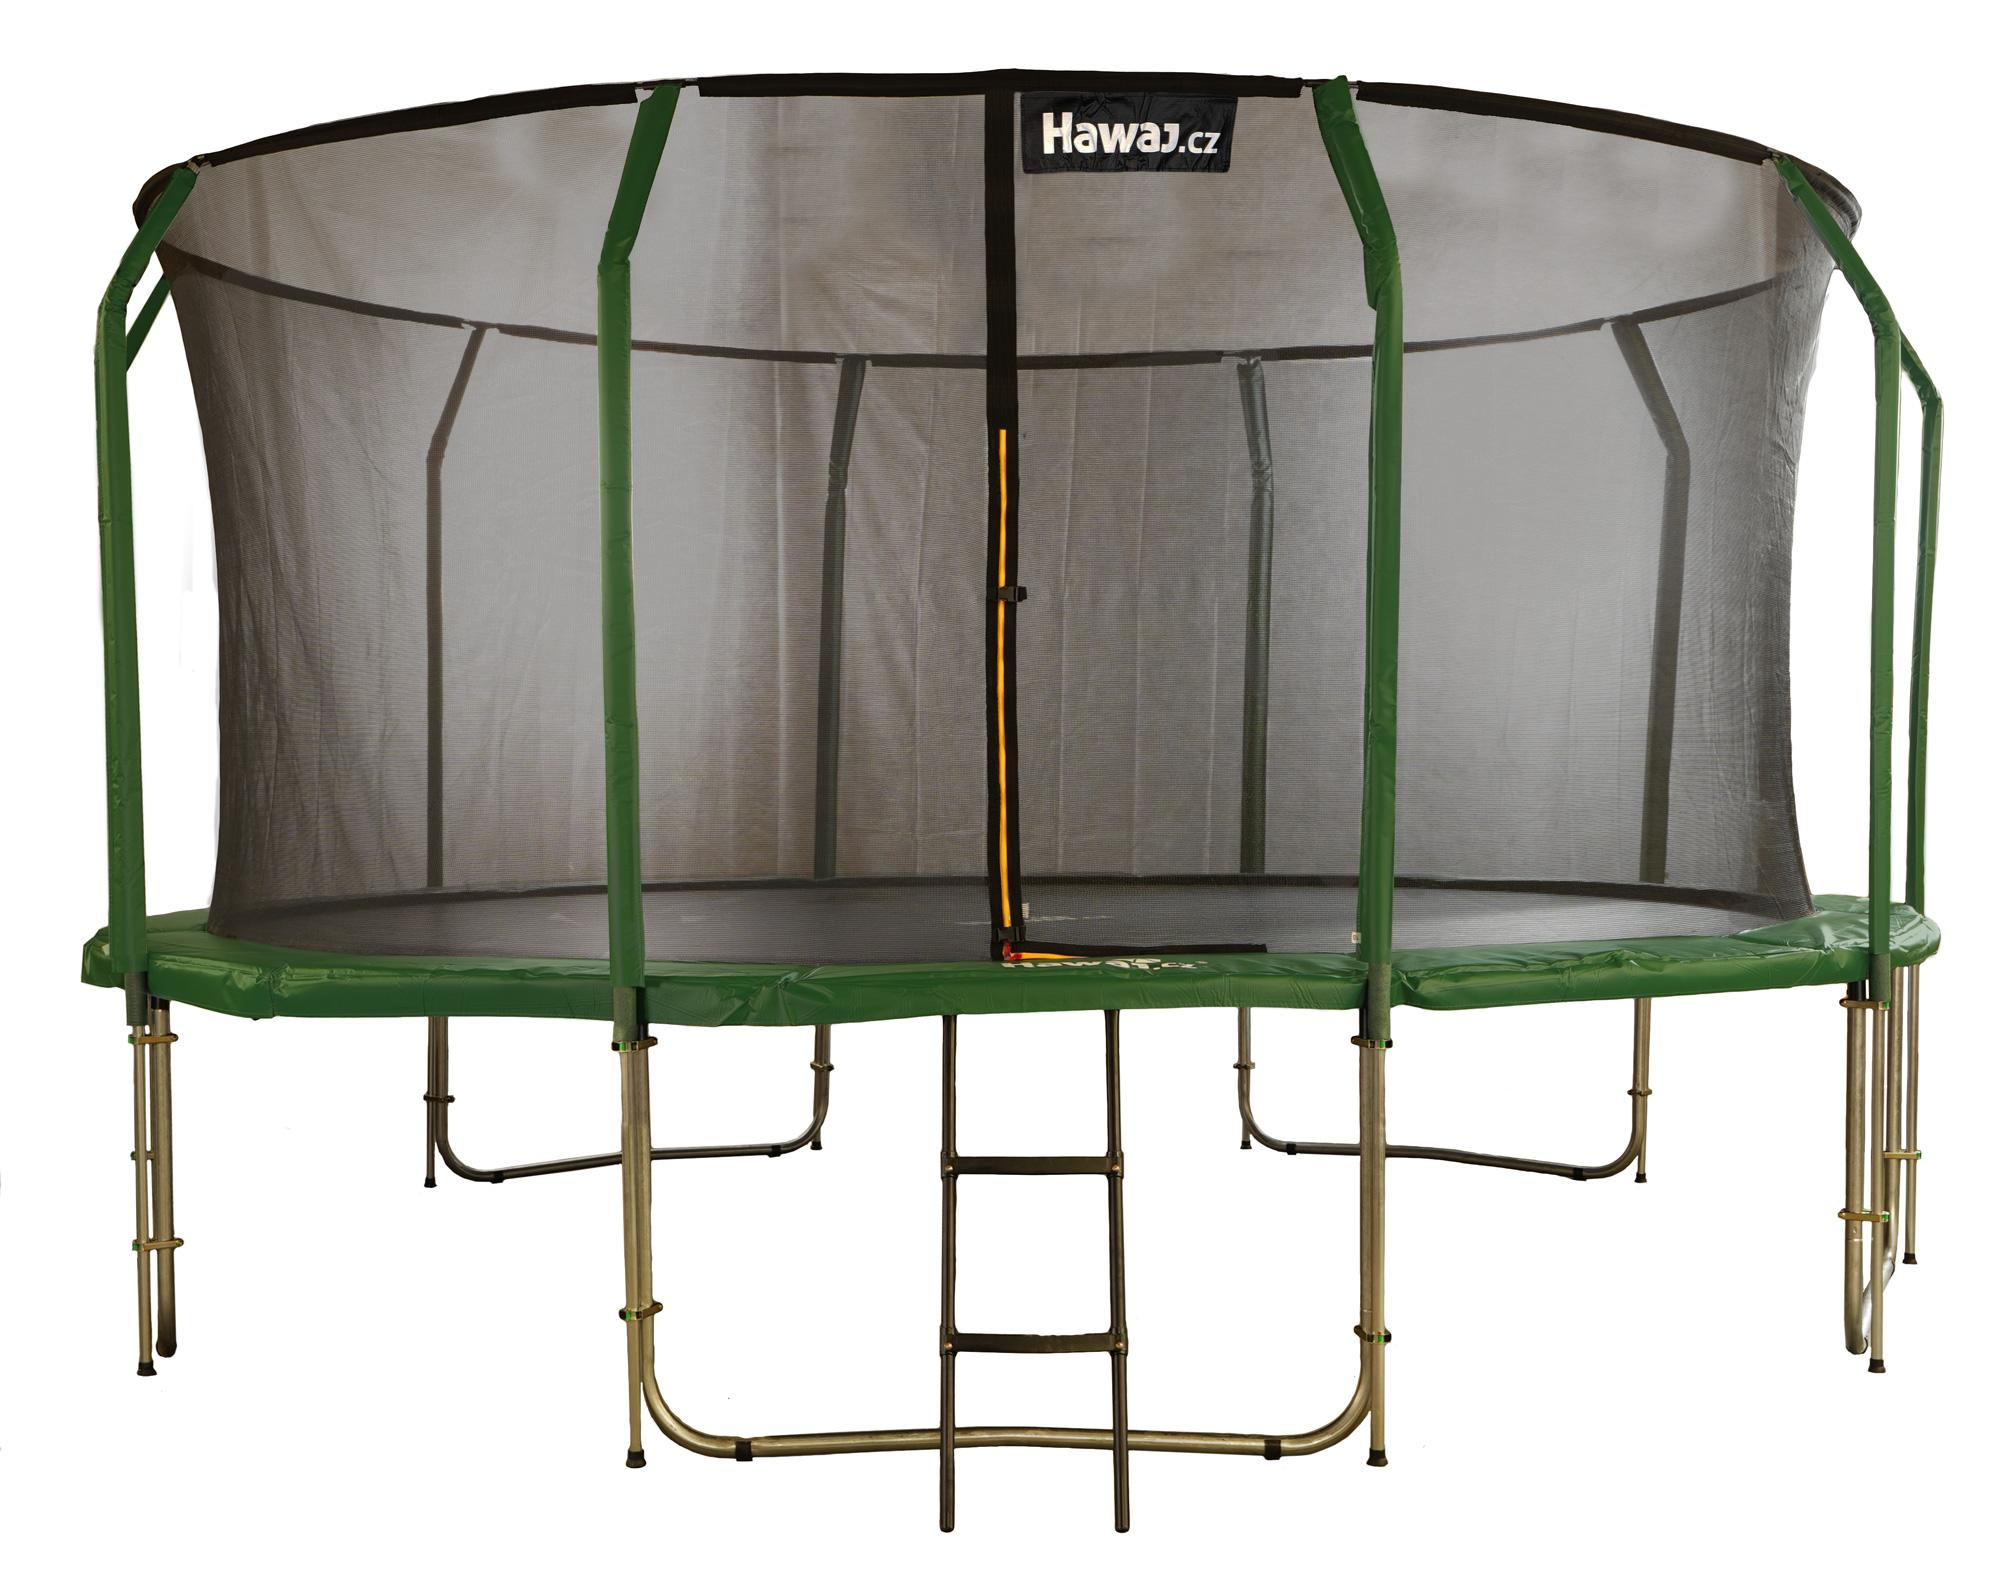 Trampolína Hawaj 457 cm + vnitřní ochranná sít + schůdky